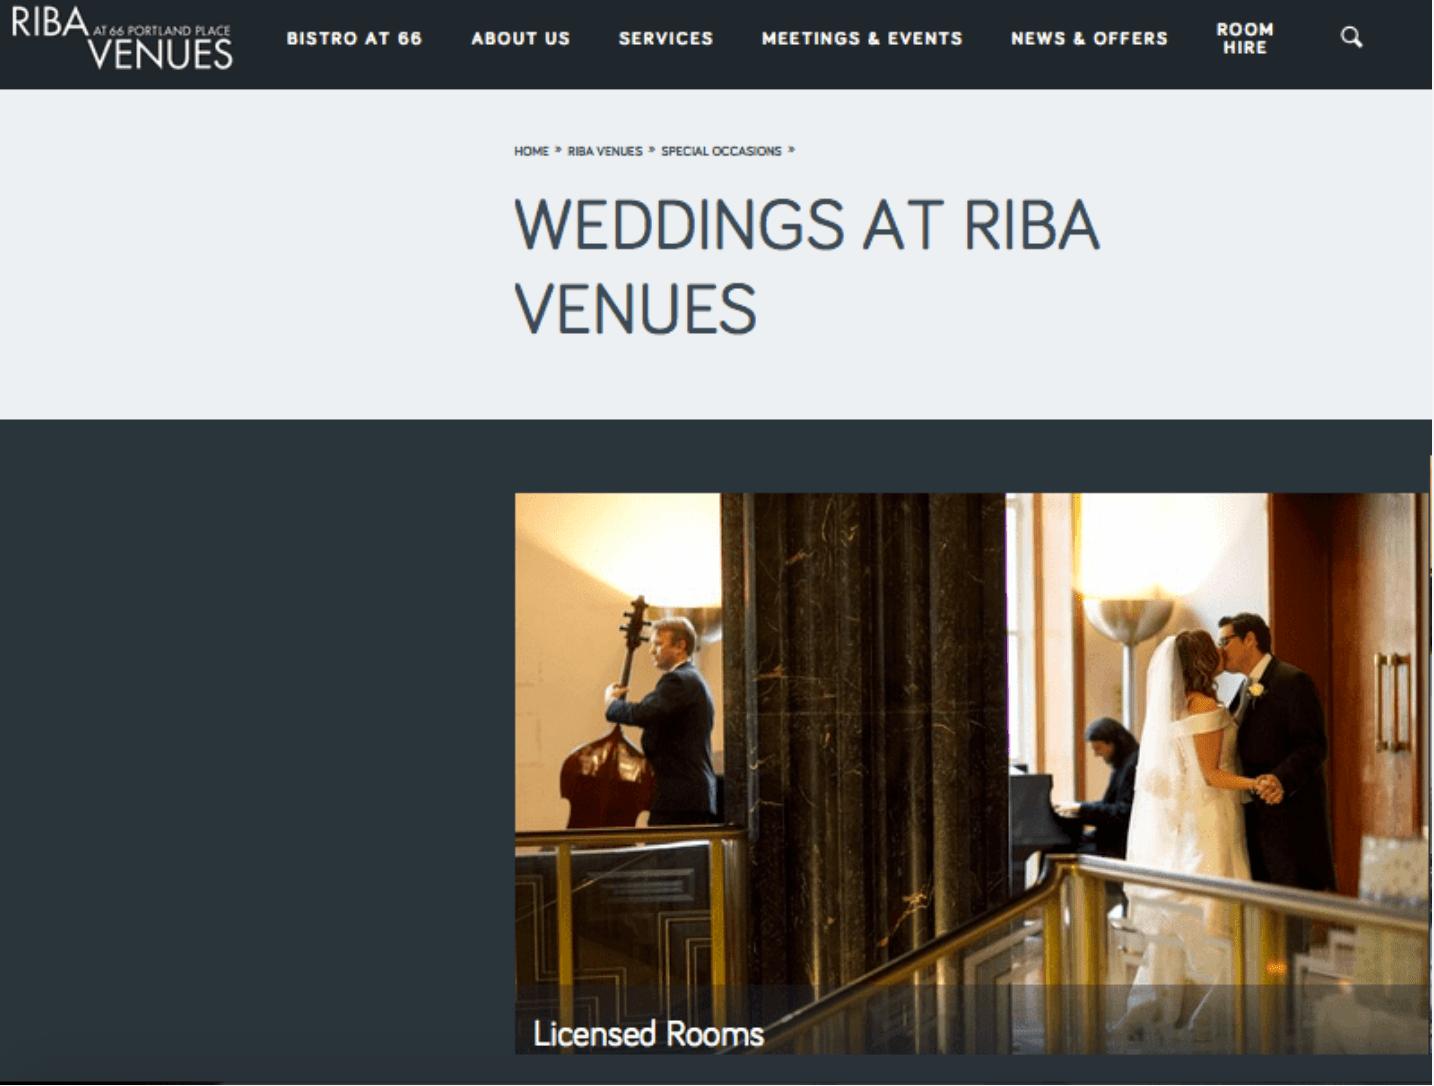 RIBA website photograph